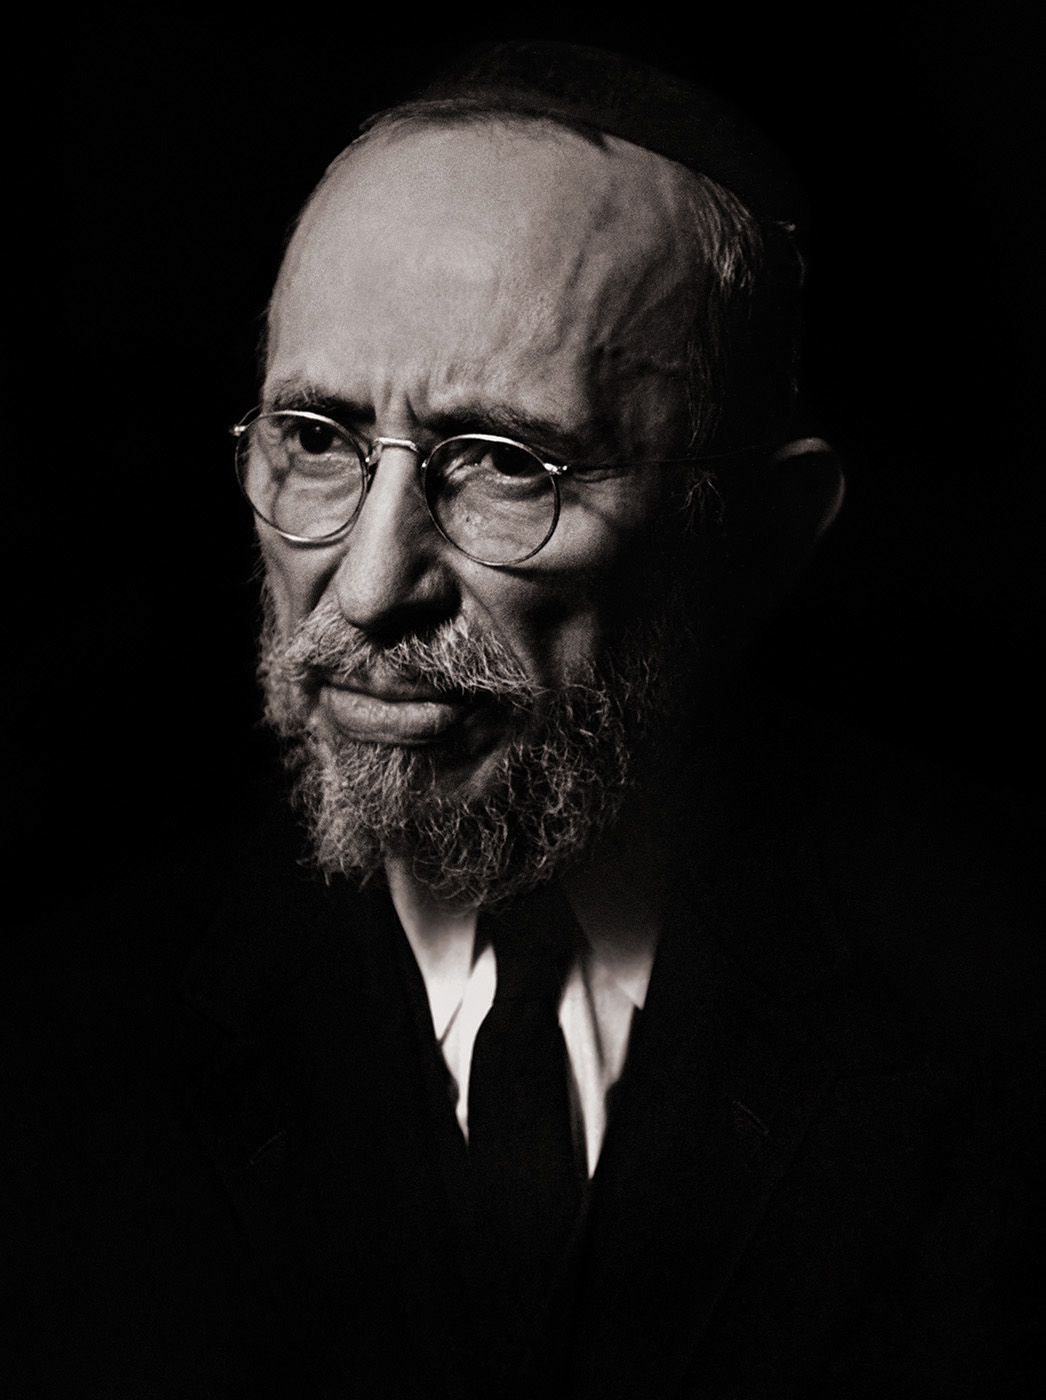 Rabbi Schoenfeld, New York, 1940